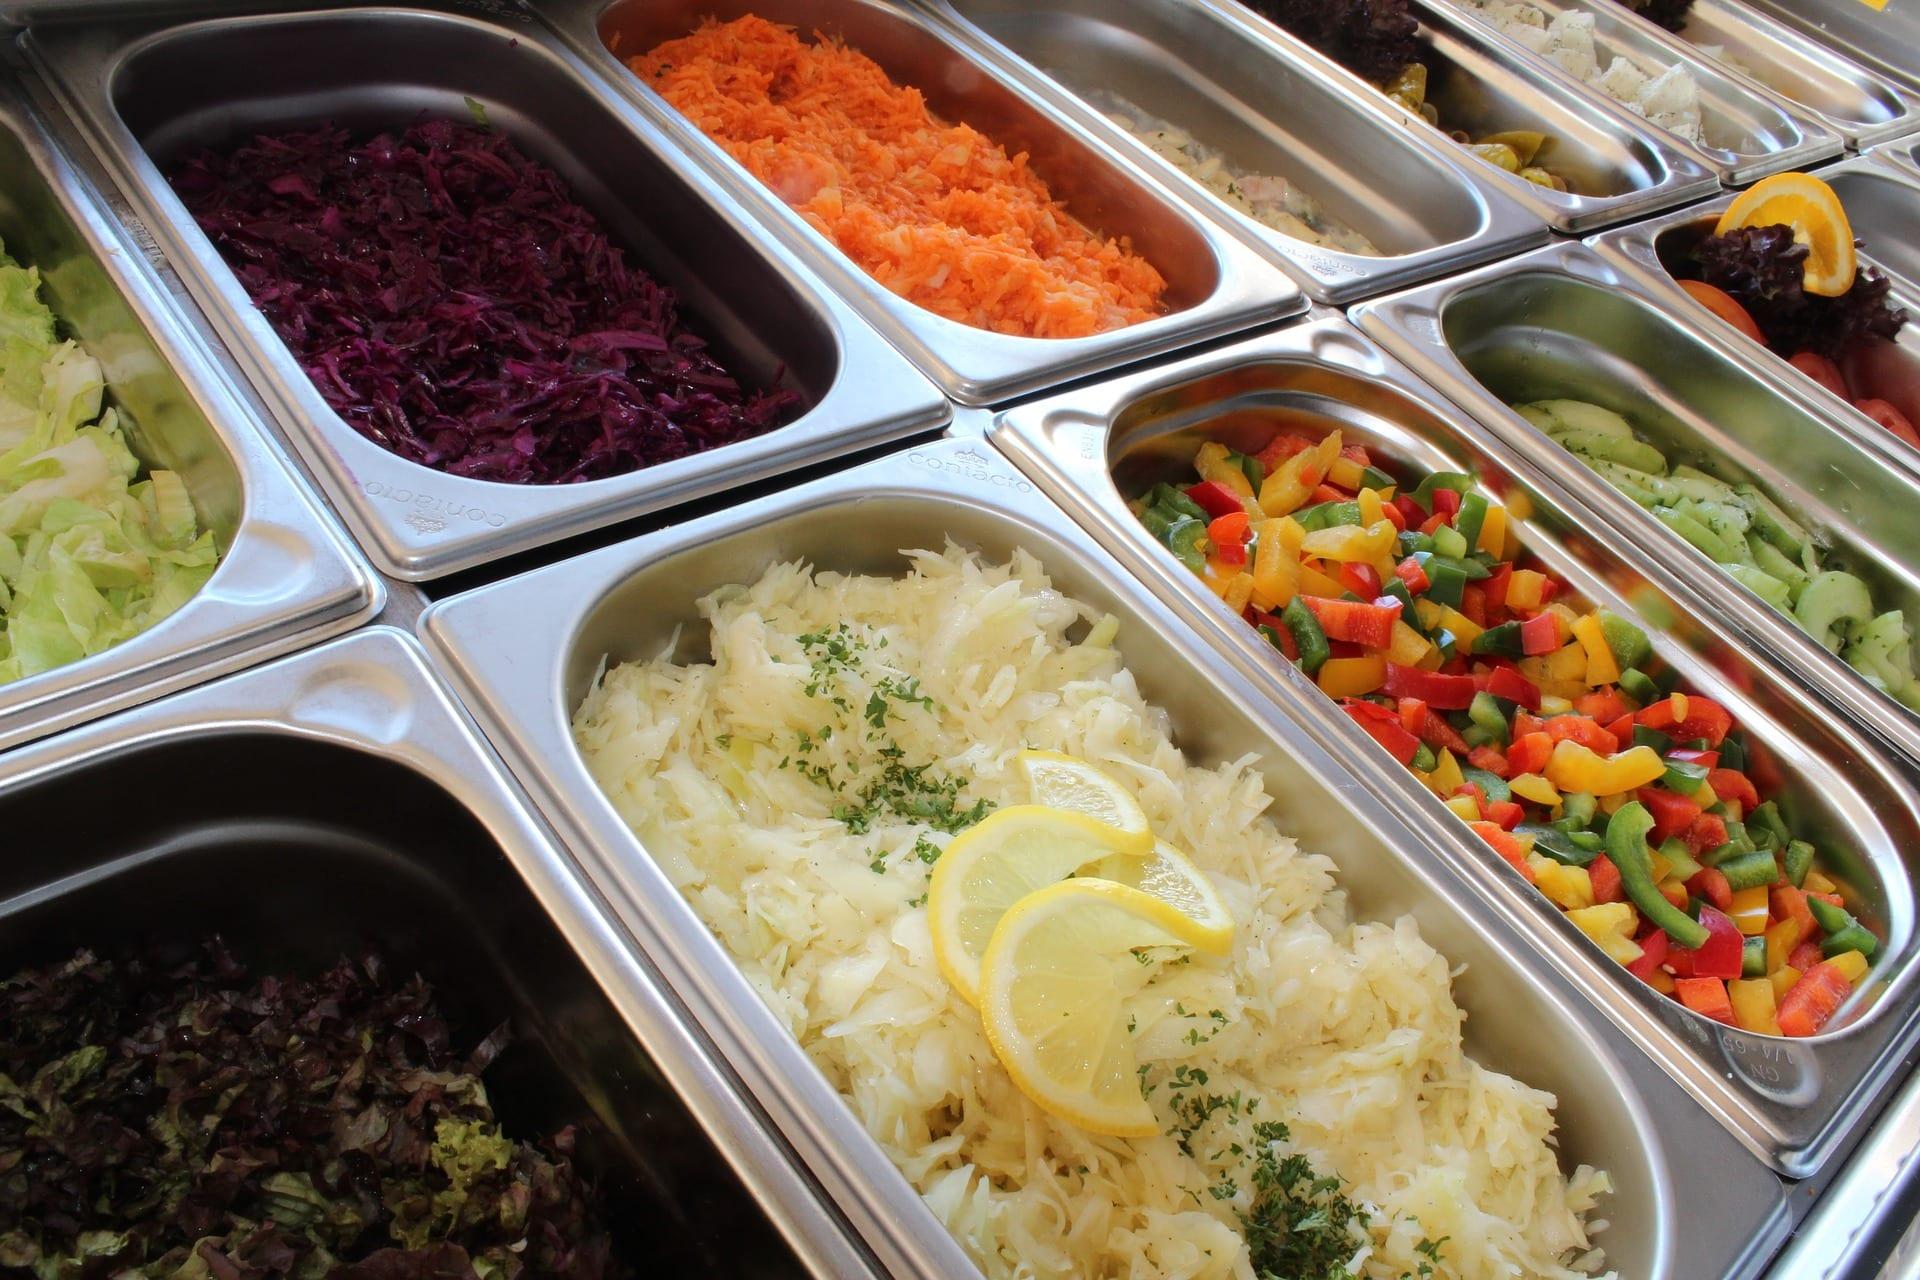 salad-bar-2094459_1920